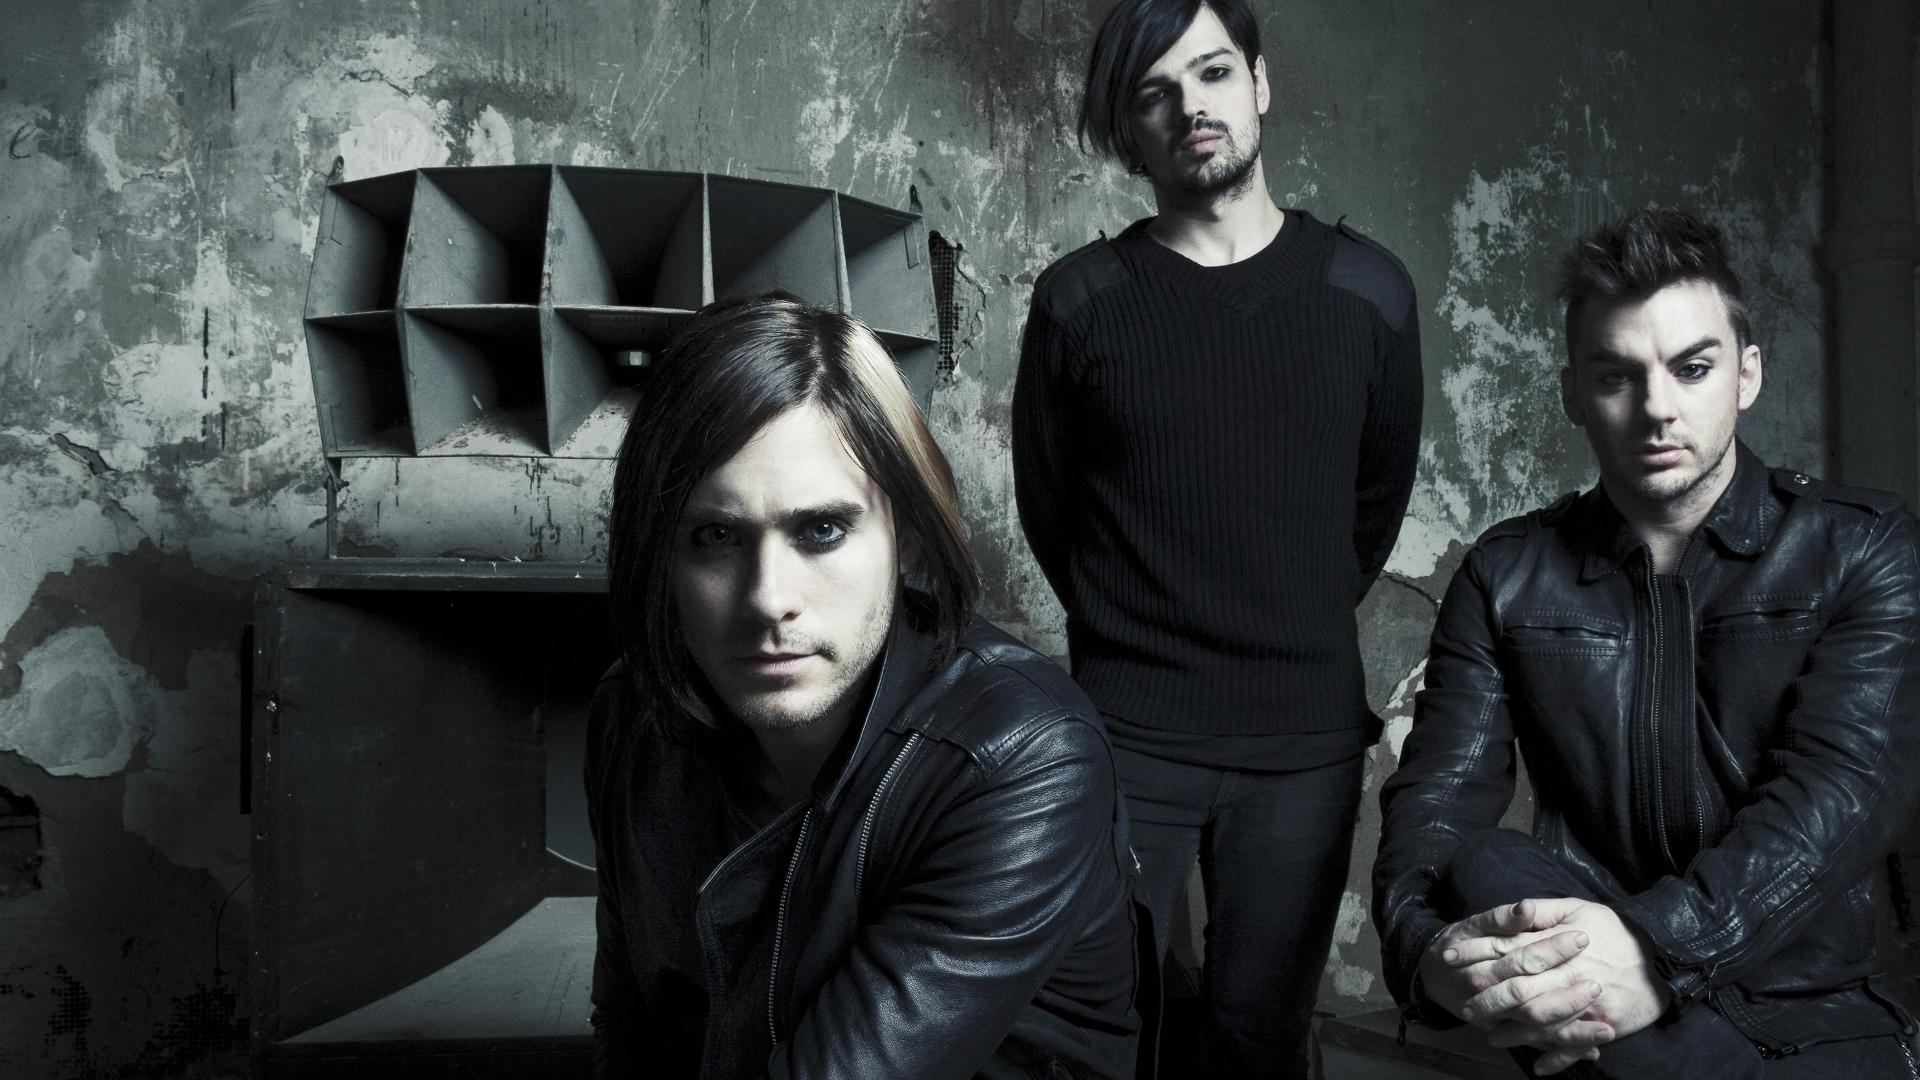 30 Seconds to Mars | Music fanart | fanart.tv